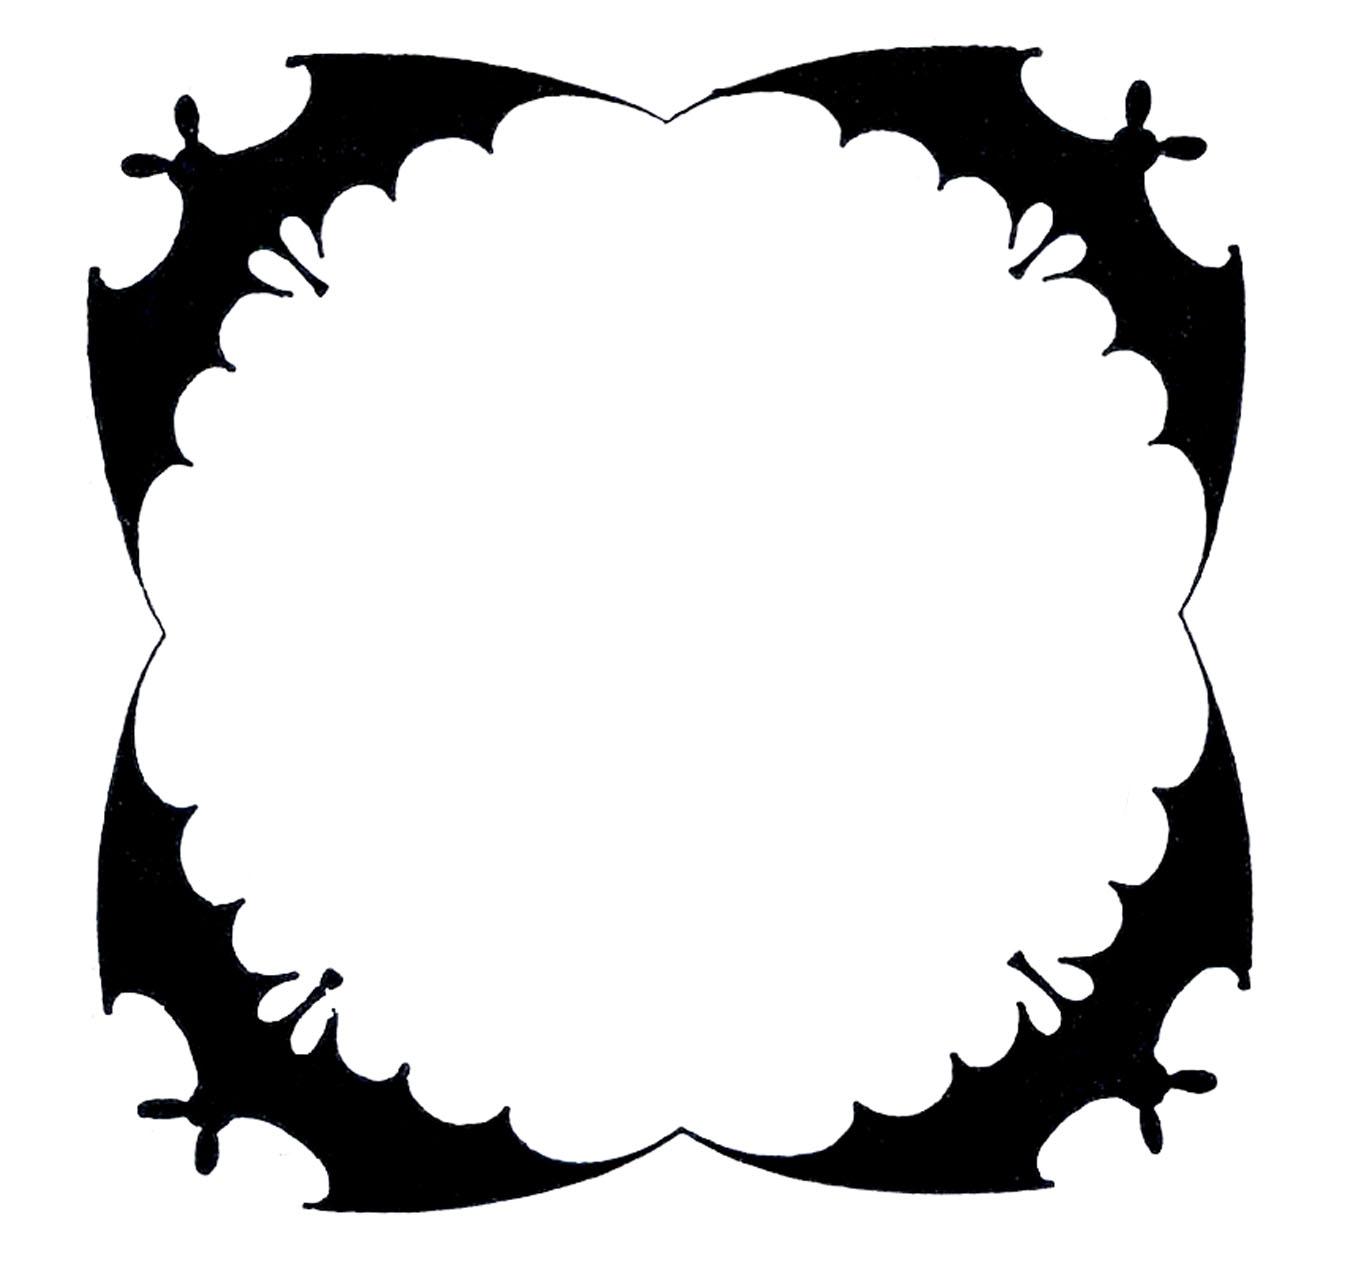 1350x1263 Bat Black And White Bat Outline Clip Art